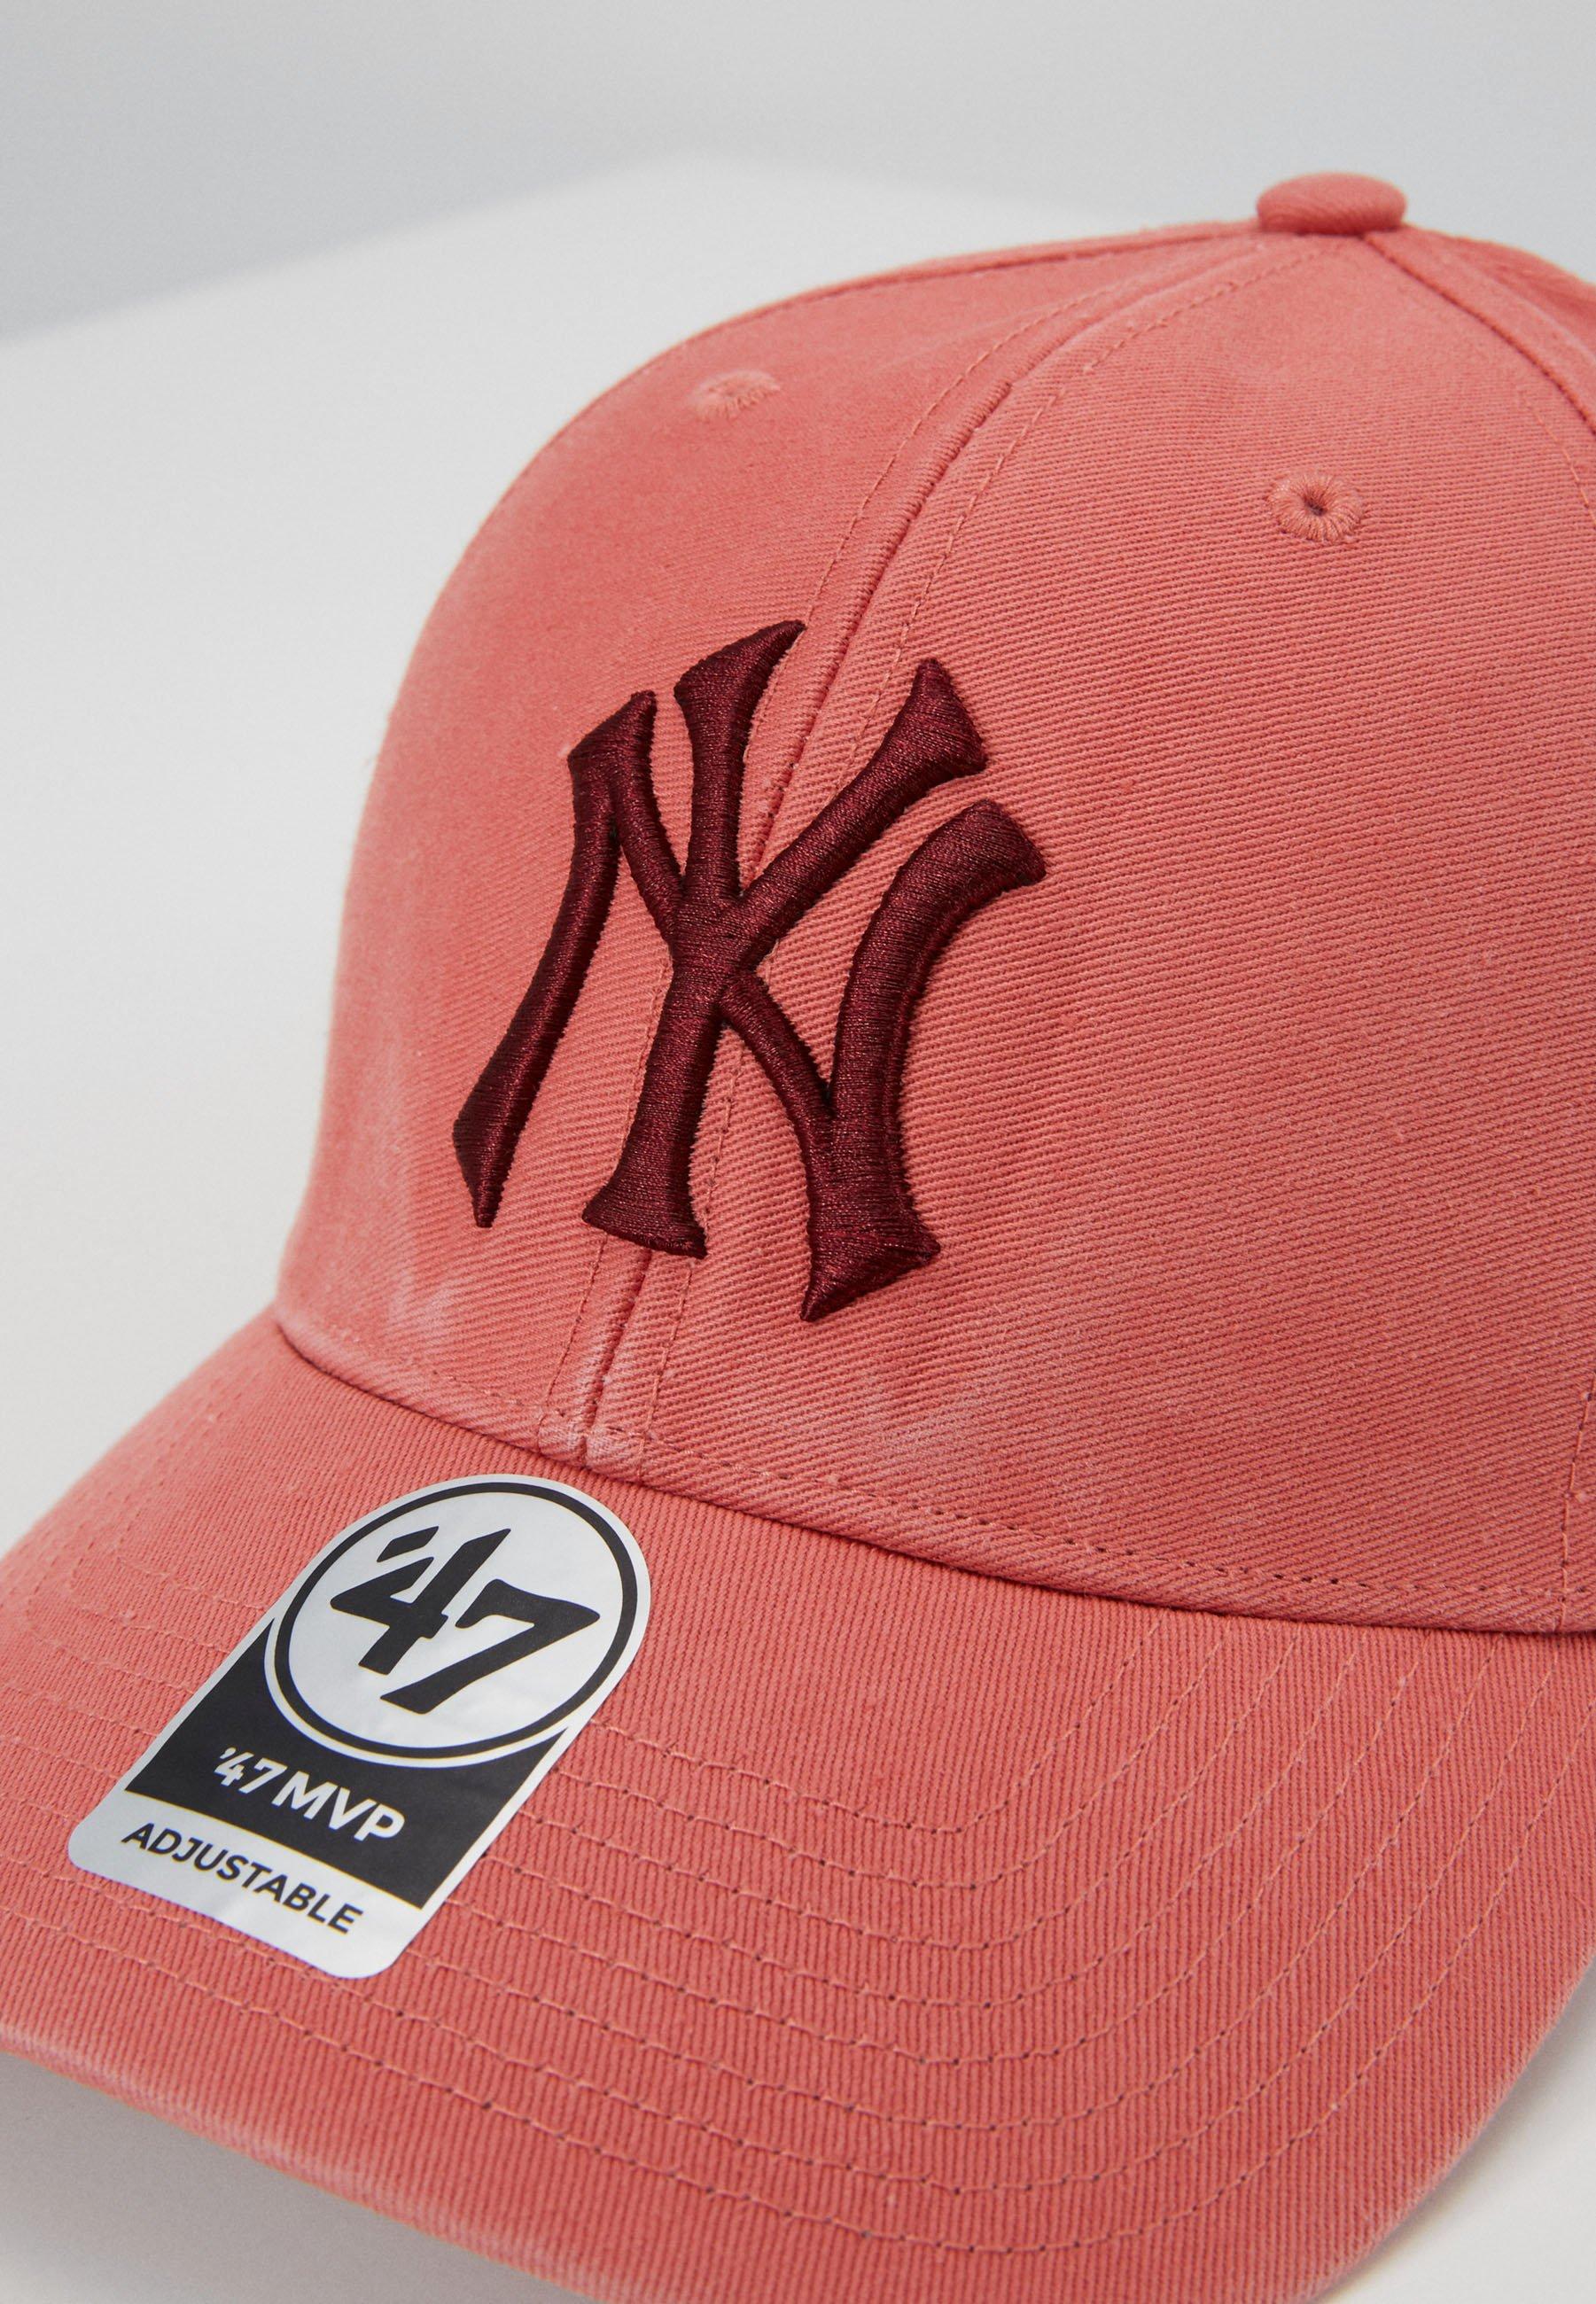 Homme MLB NEW YORK YANKEES LEGEND '47 UNISEX - Casquette